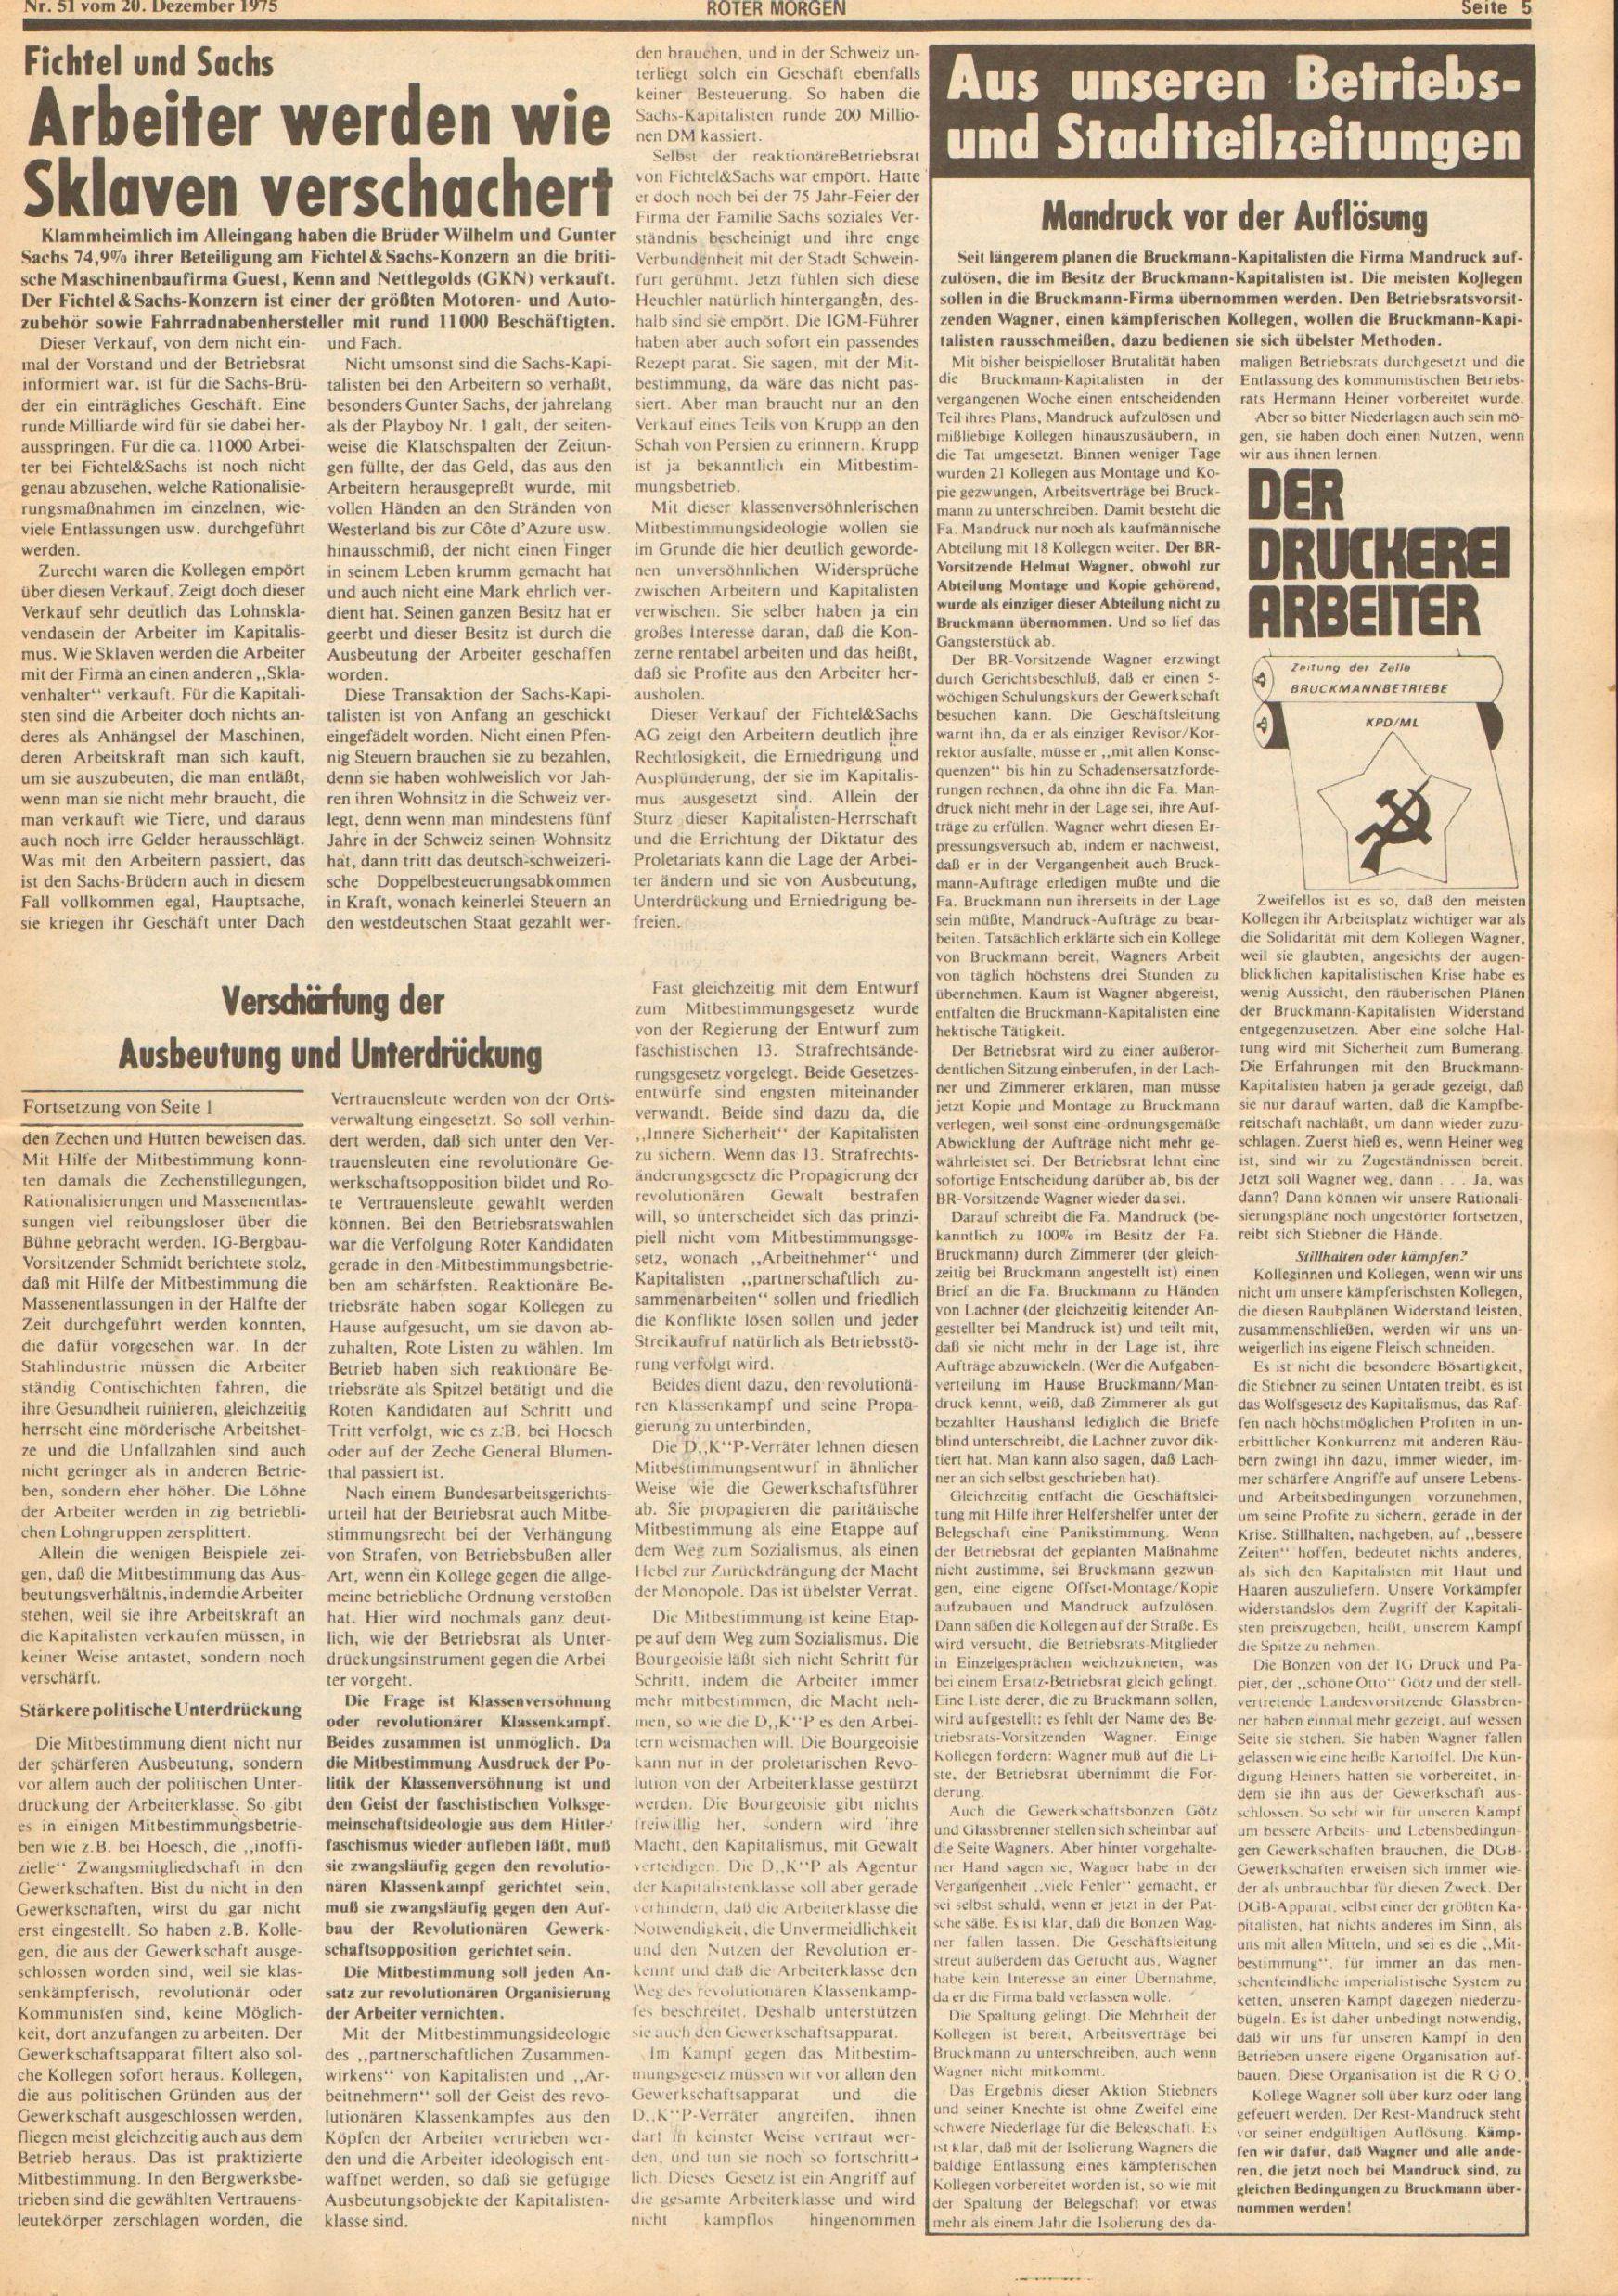 Roter Morgen, 9. Jg., 20. Dezember 1975, Nr. 51, Seite 5